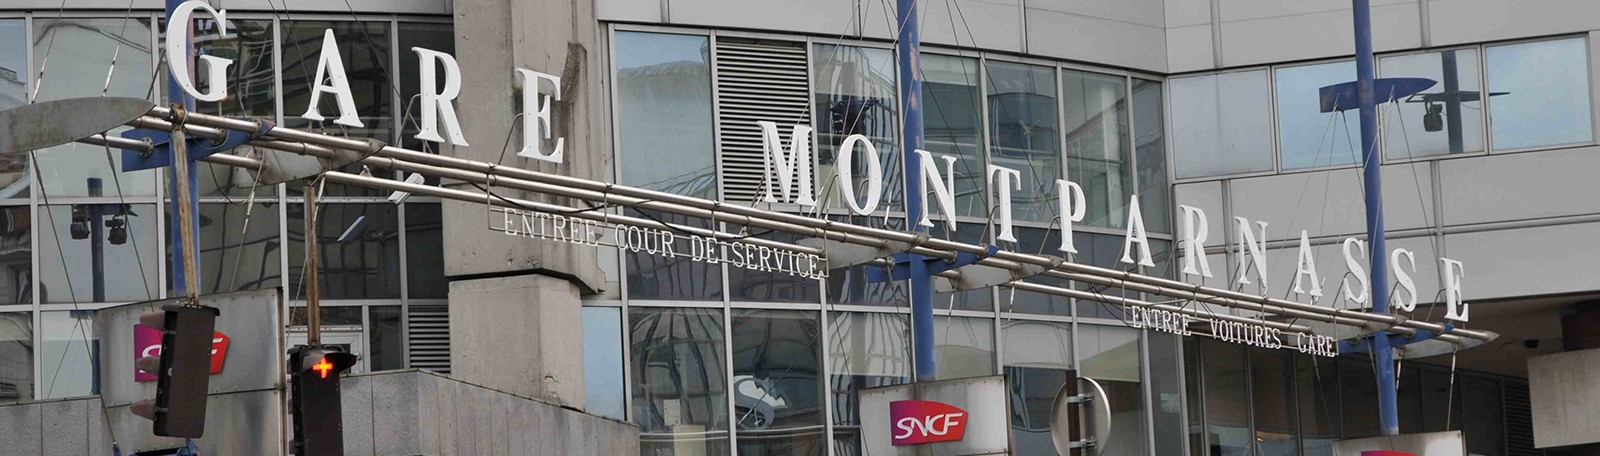 Parking Paris Gare Montparnasse